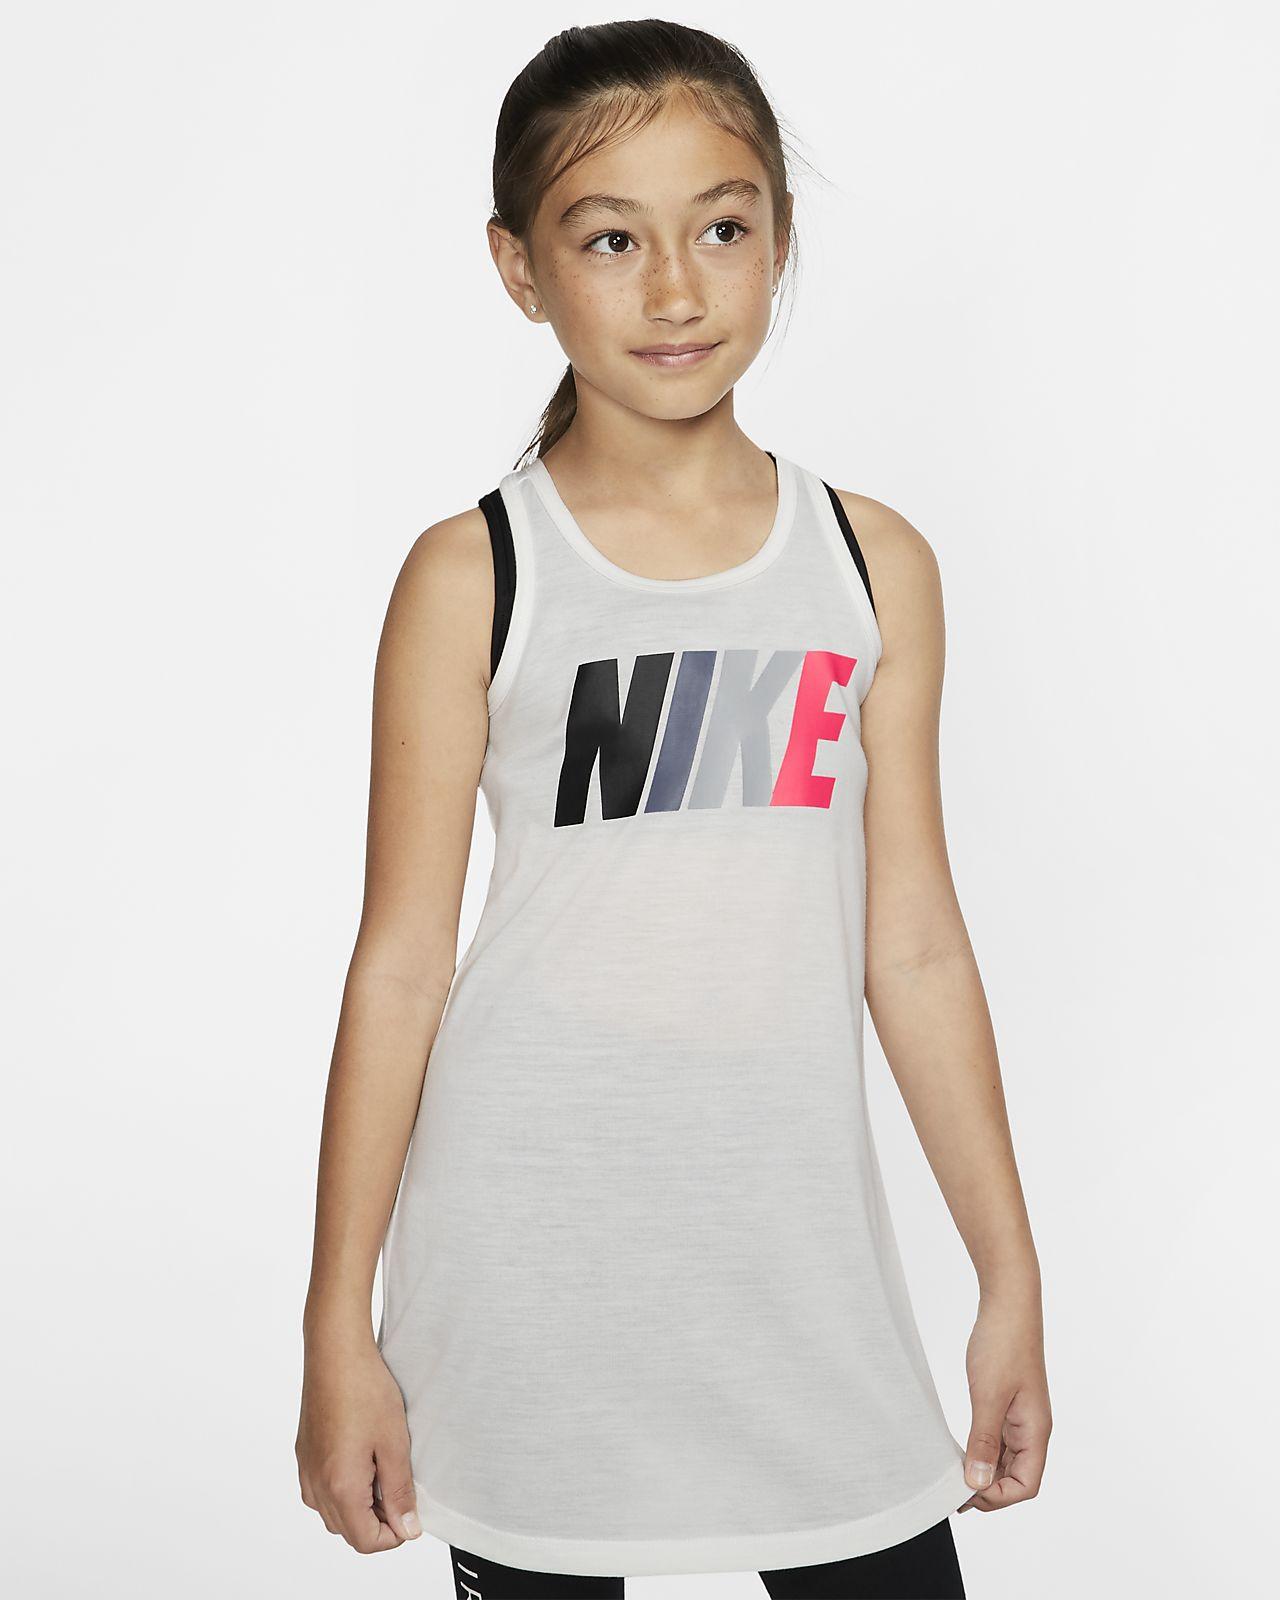 91c4f895e33 Φόρεμα Nike JDI για μικρά παιδιά. Nike.com GR